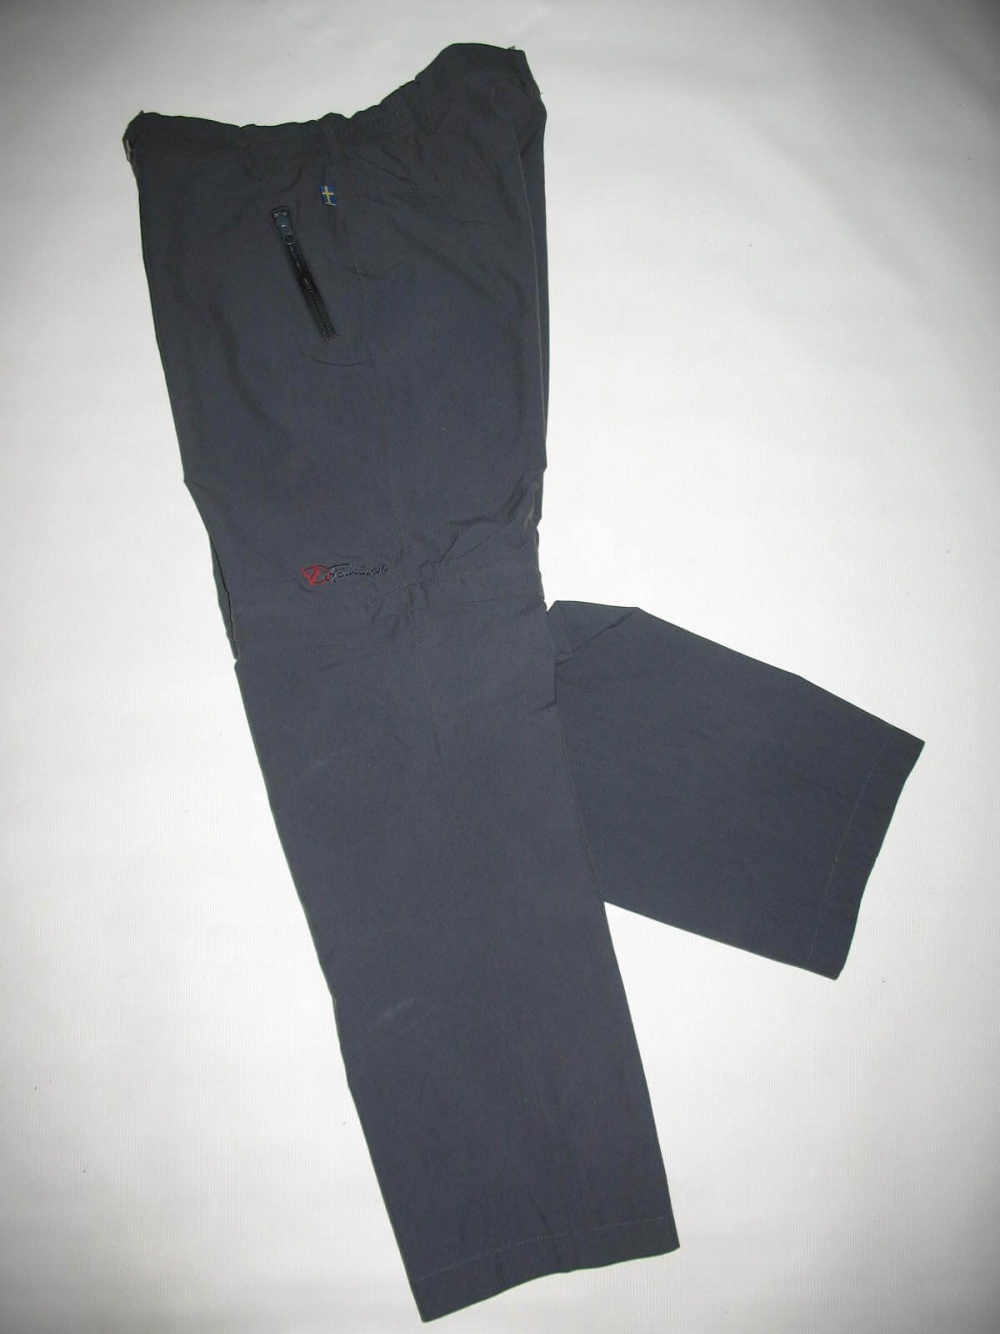 Штаны FJALLRAVEN 2in1 pants lady (размер 36/S) - 2